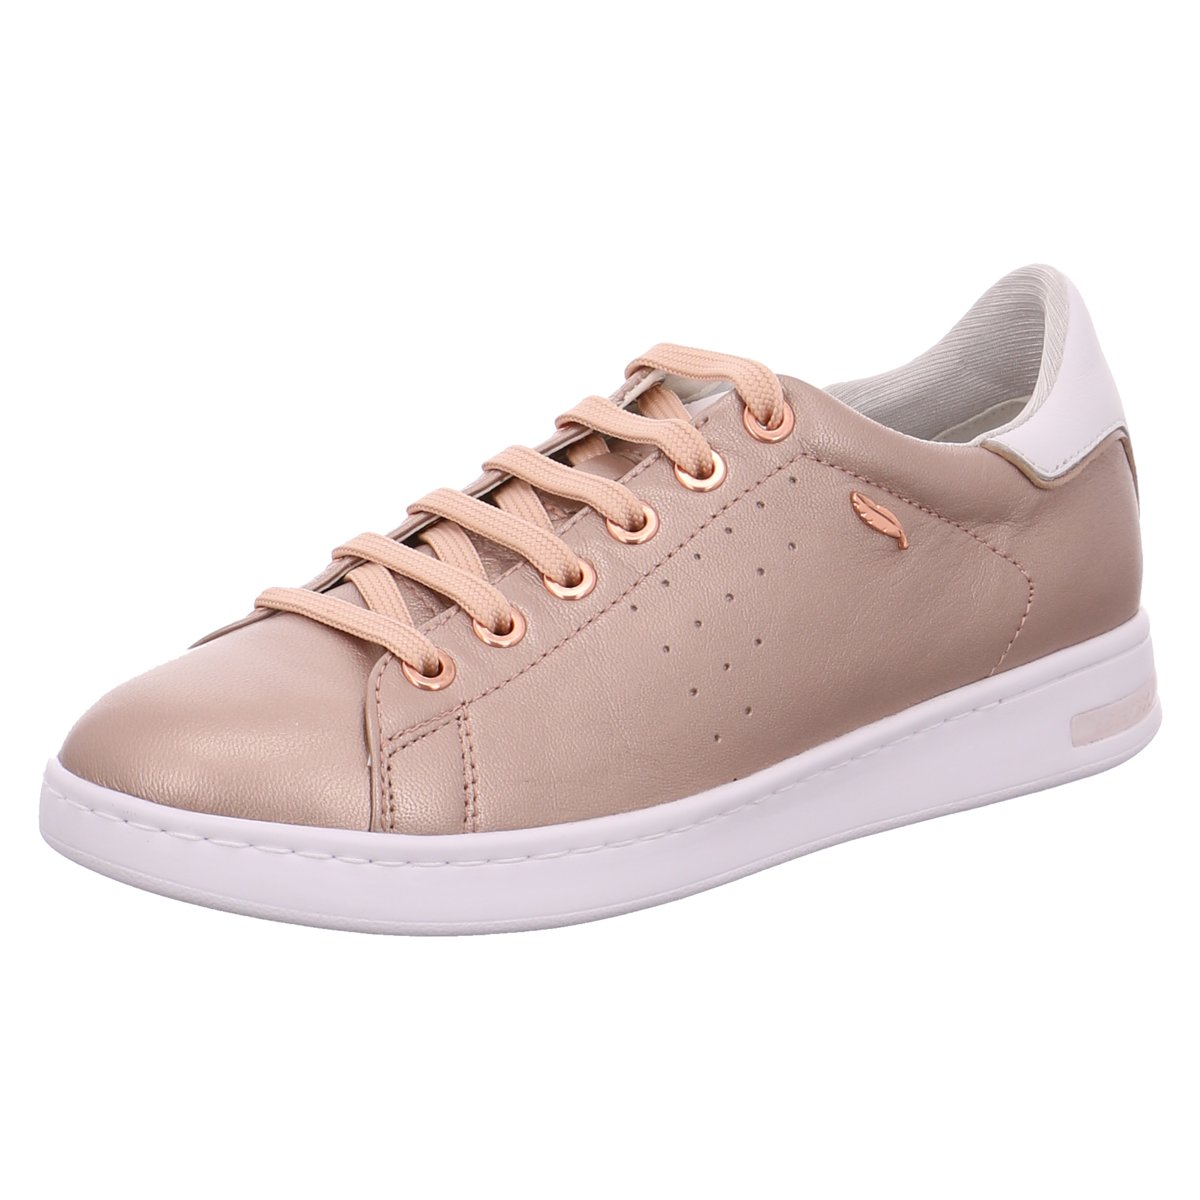 NEU Geox Damen Sneaker D621BB 000BV    D Yaysen D621BB 000BV C8124 rosa 242068